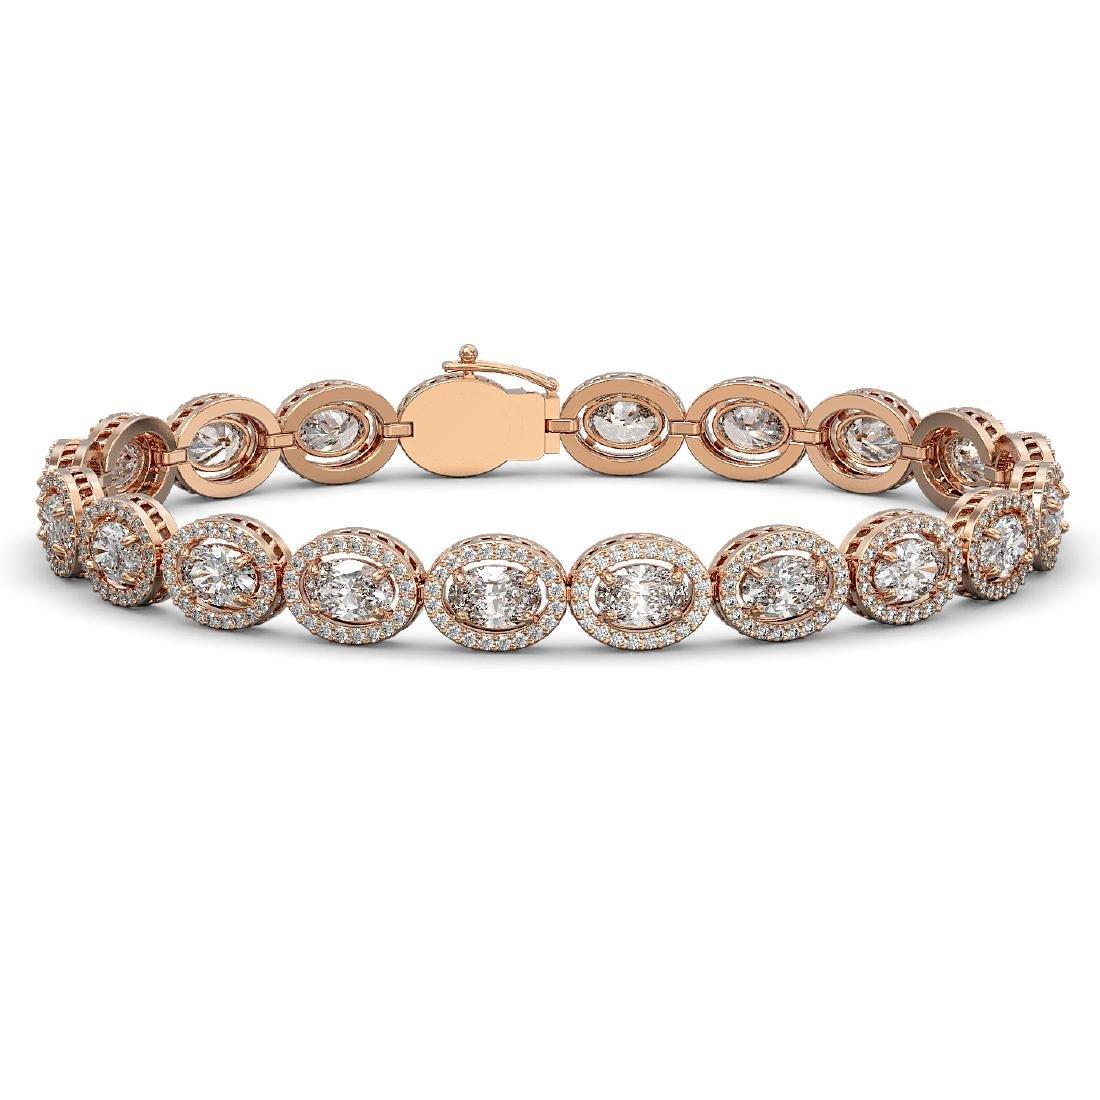 13.25 CTW Oval Diamond Designer Bracelet 18K Rose Gold